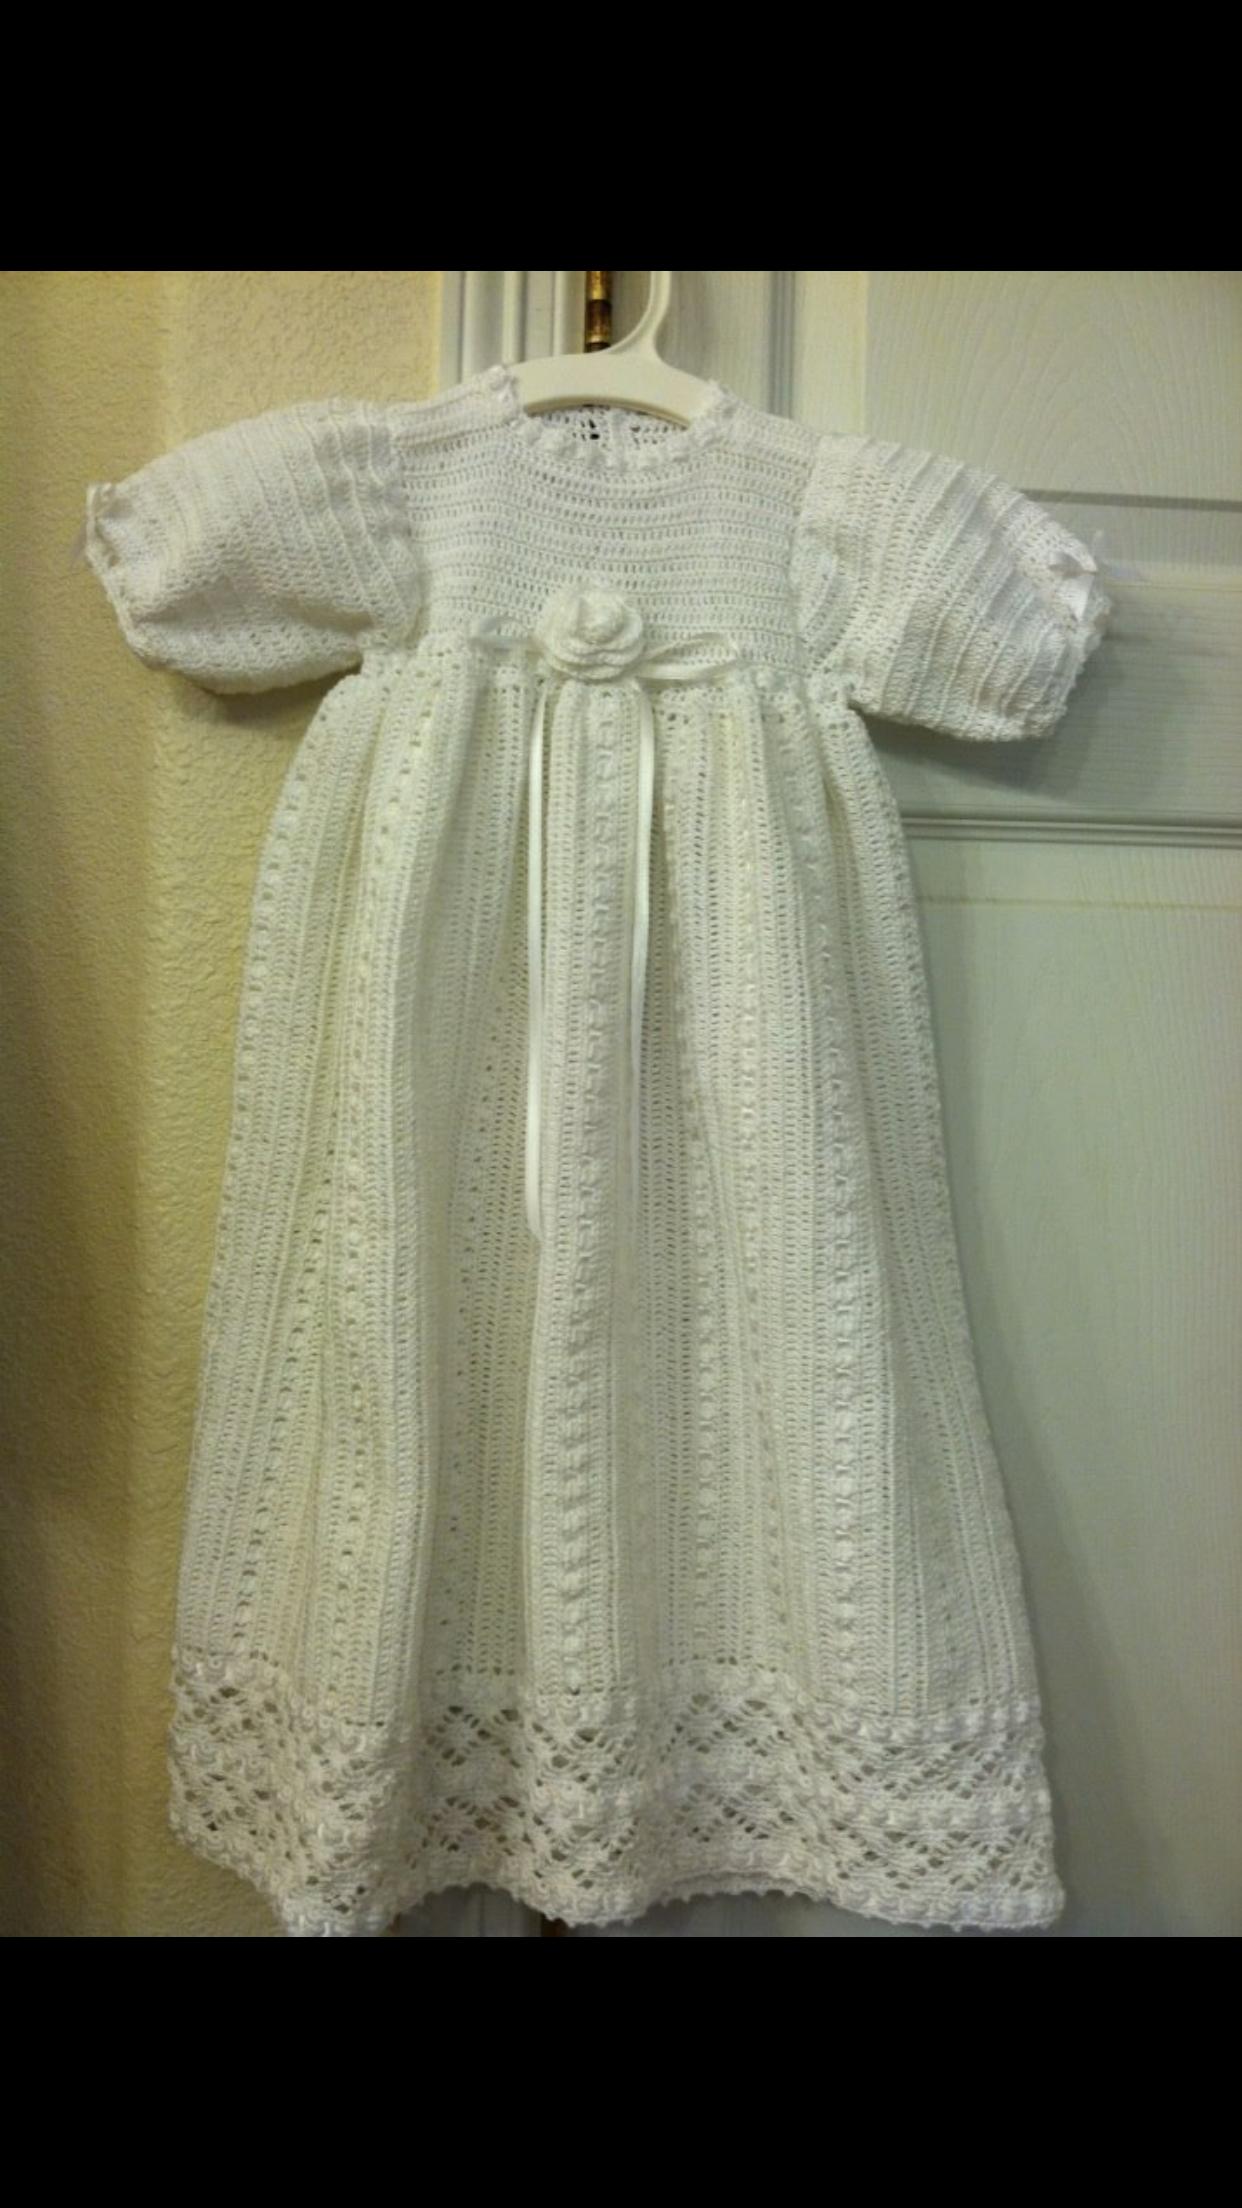 Crochet Baby Christening Gown